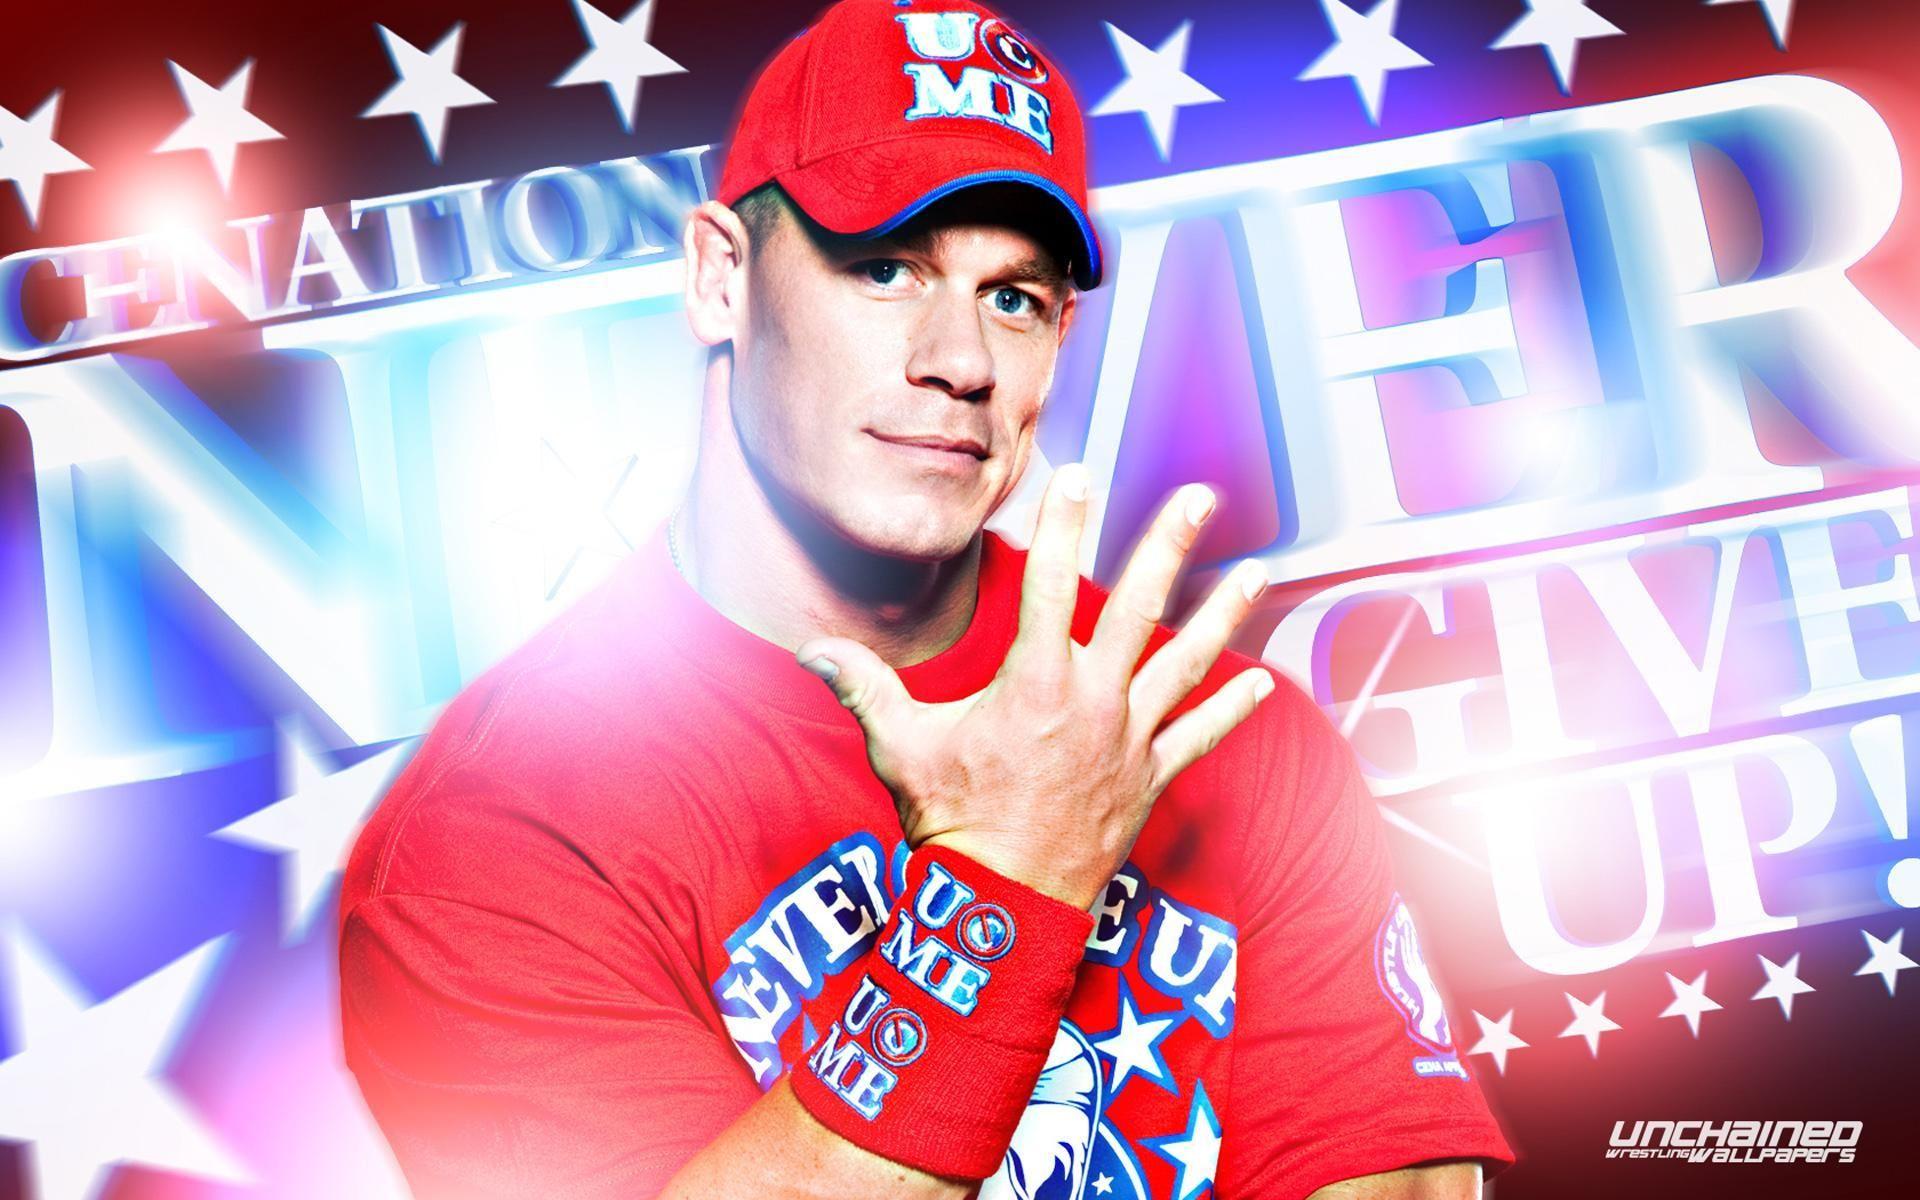 John Cena Wwe Wallpaper 960 Tanukinosippo John Cena Pictures